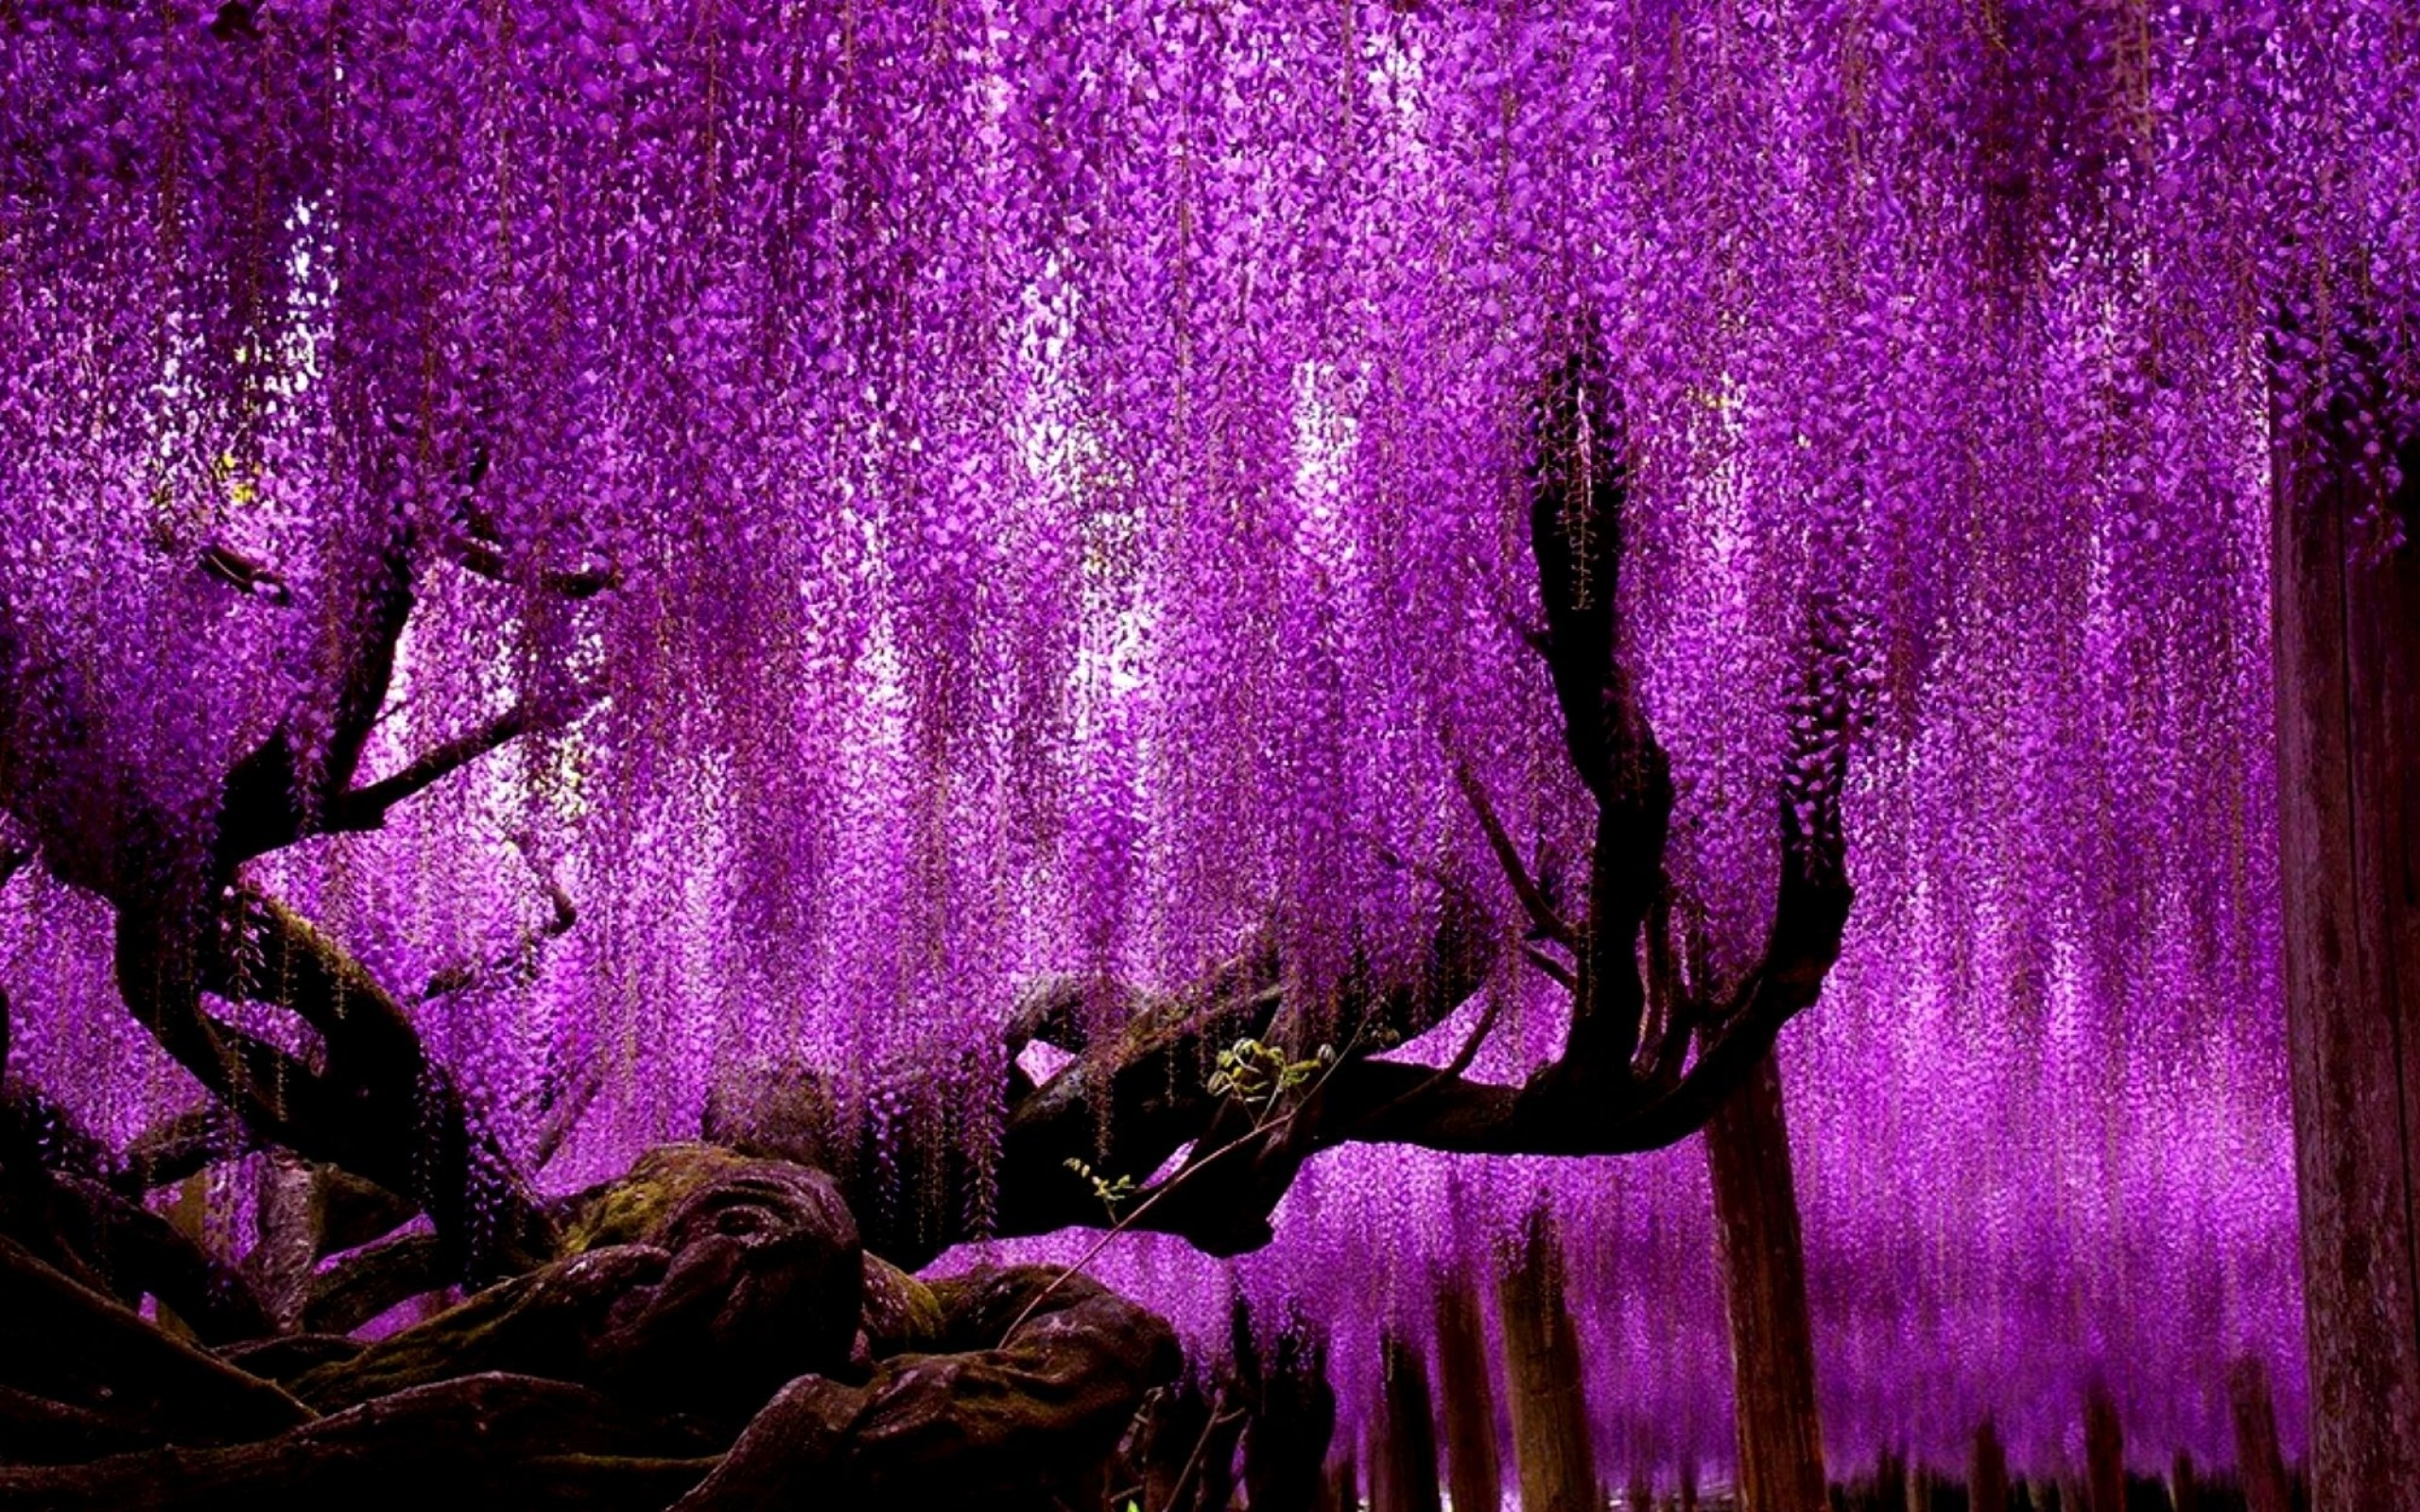 Res: 2560x1600, Purple-Flowers-Wisteria-Tree-Wallpaper